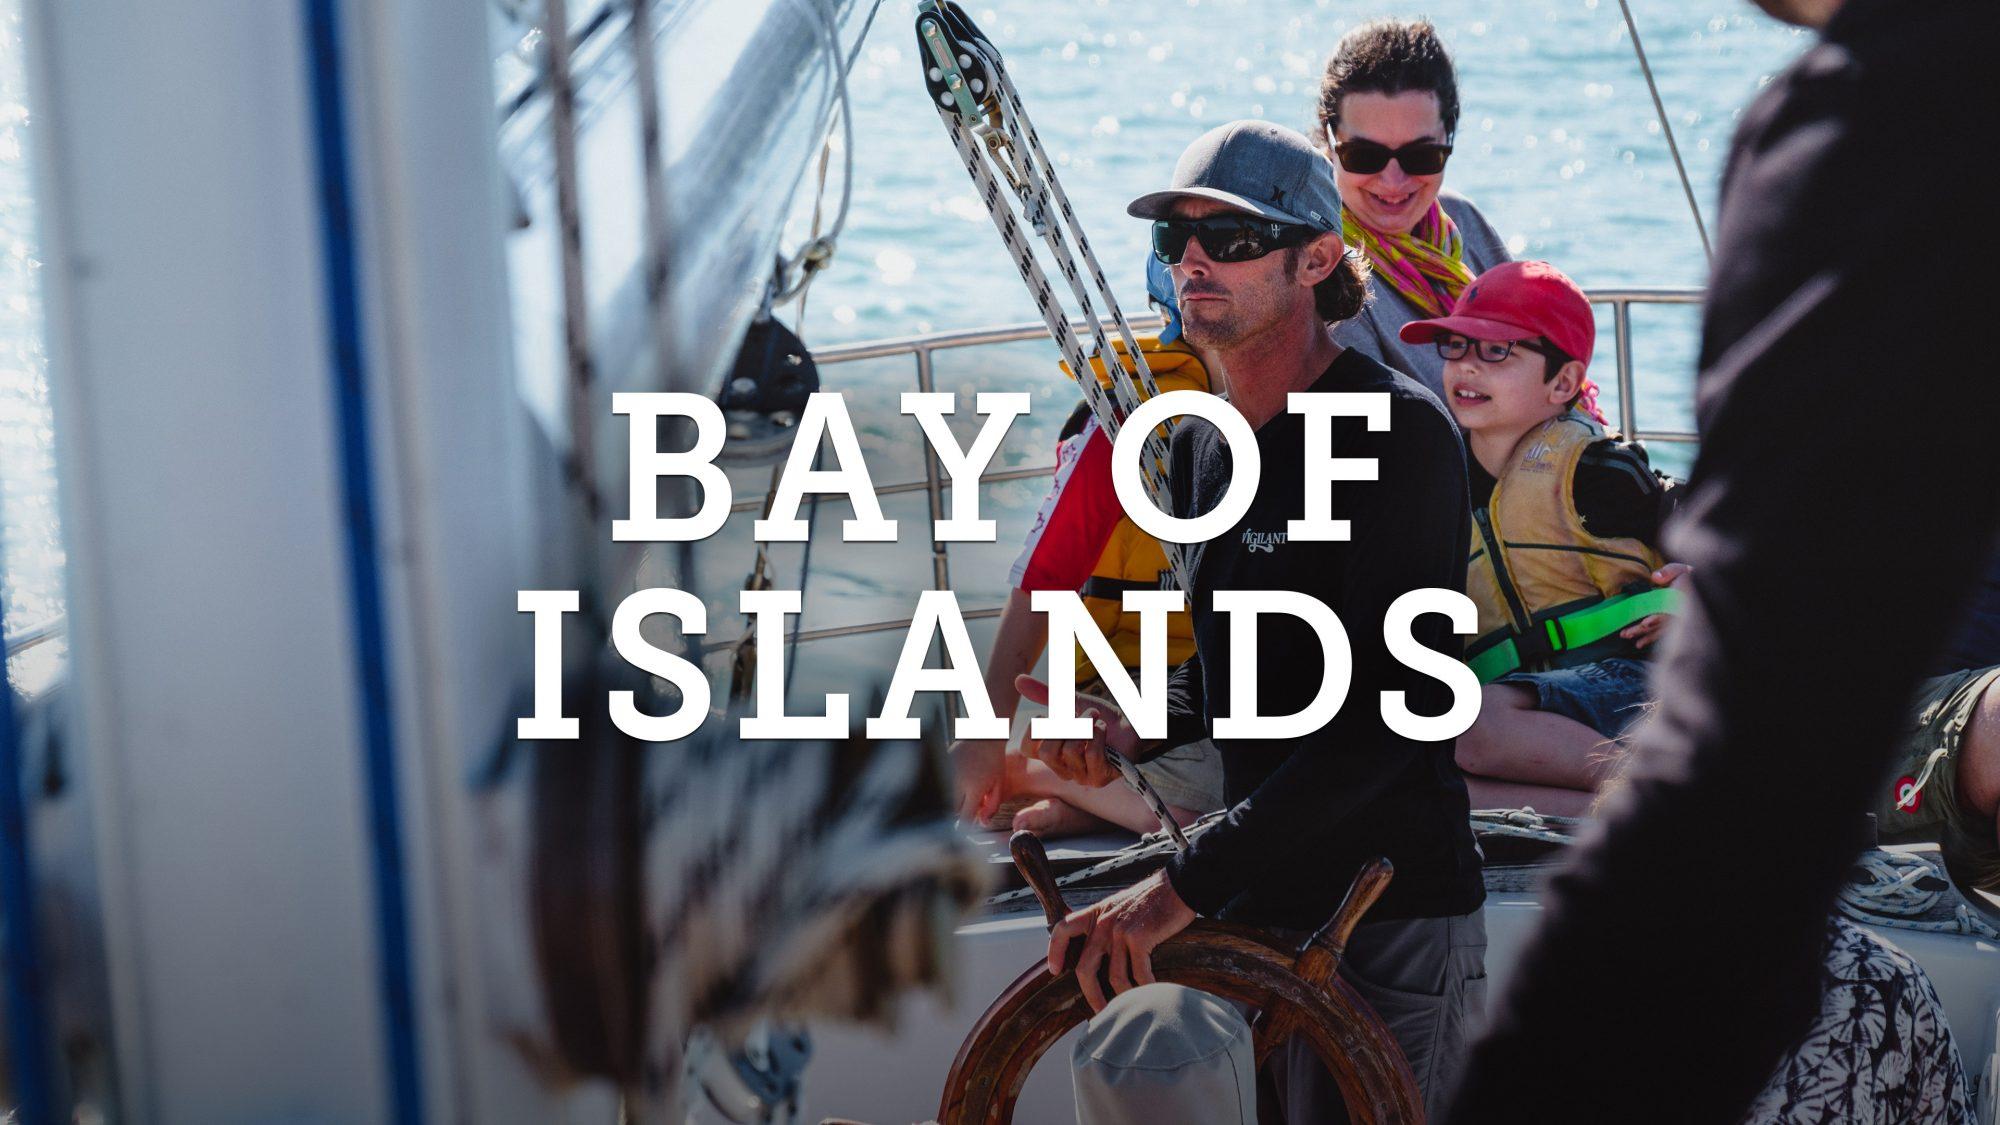 Bay of Islands Yacht Tour, New Zealand